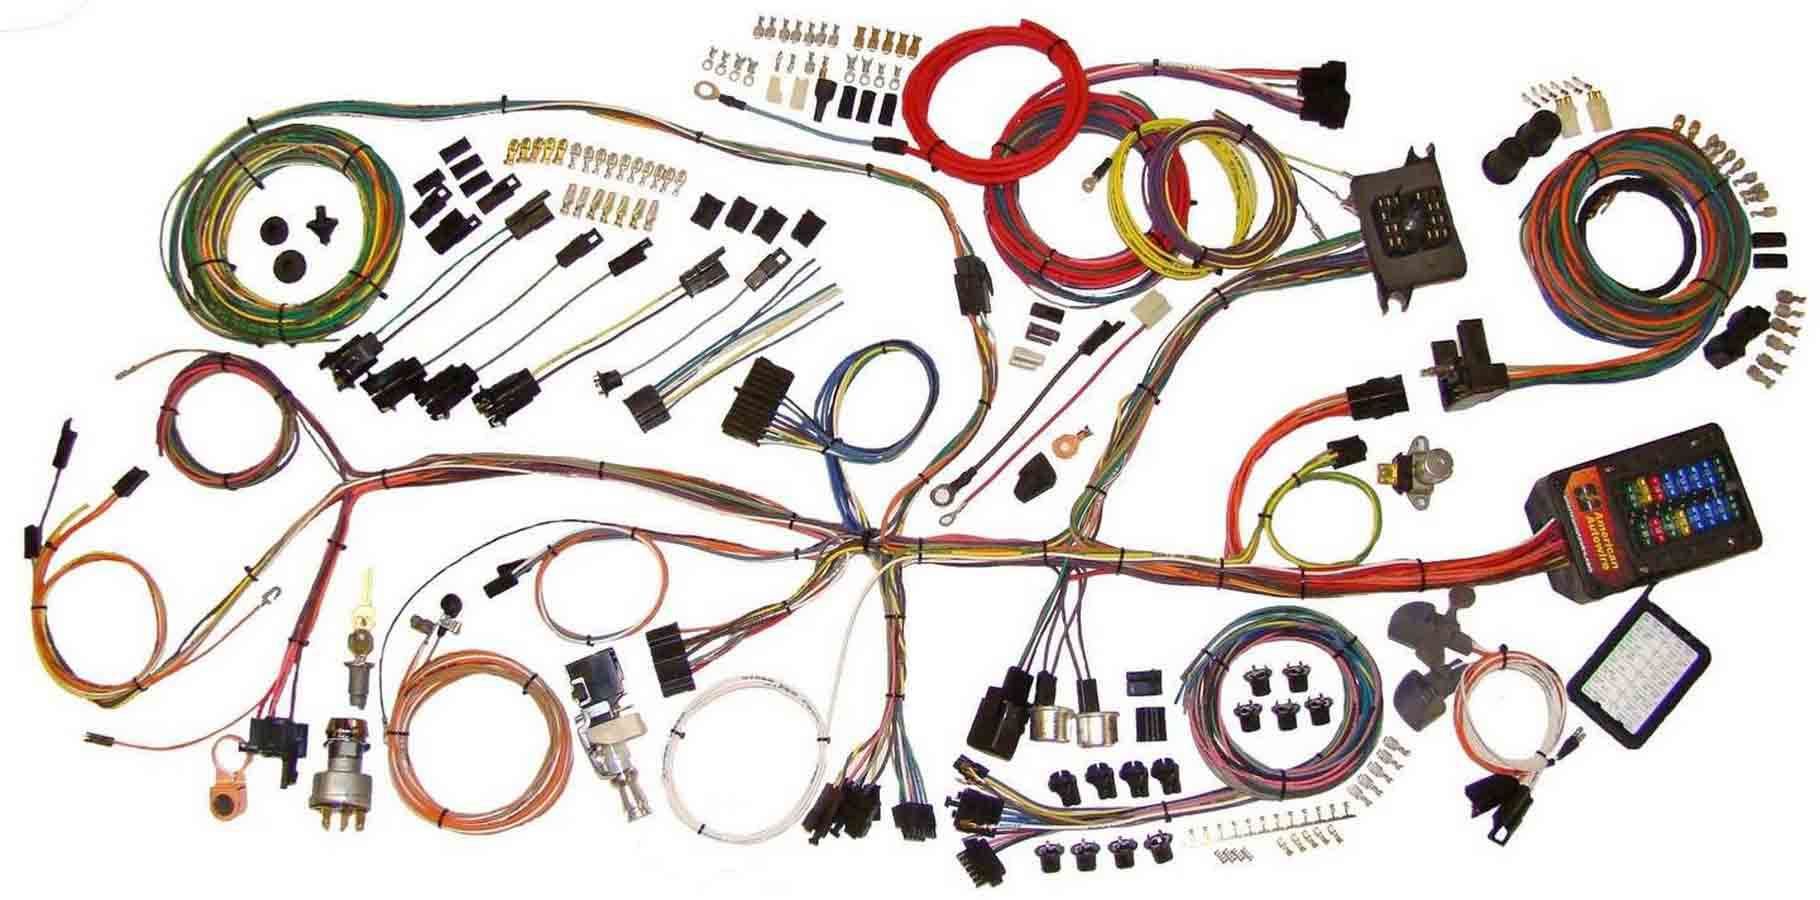 1966 Impala Wire Harness Kit Electrical Diagram Schematics Wiring Grand Prix Auto